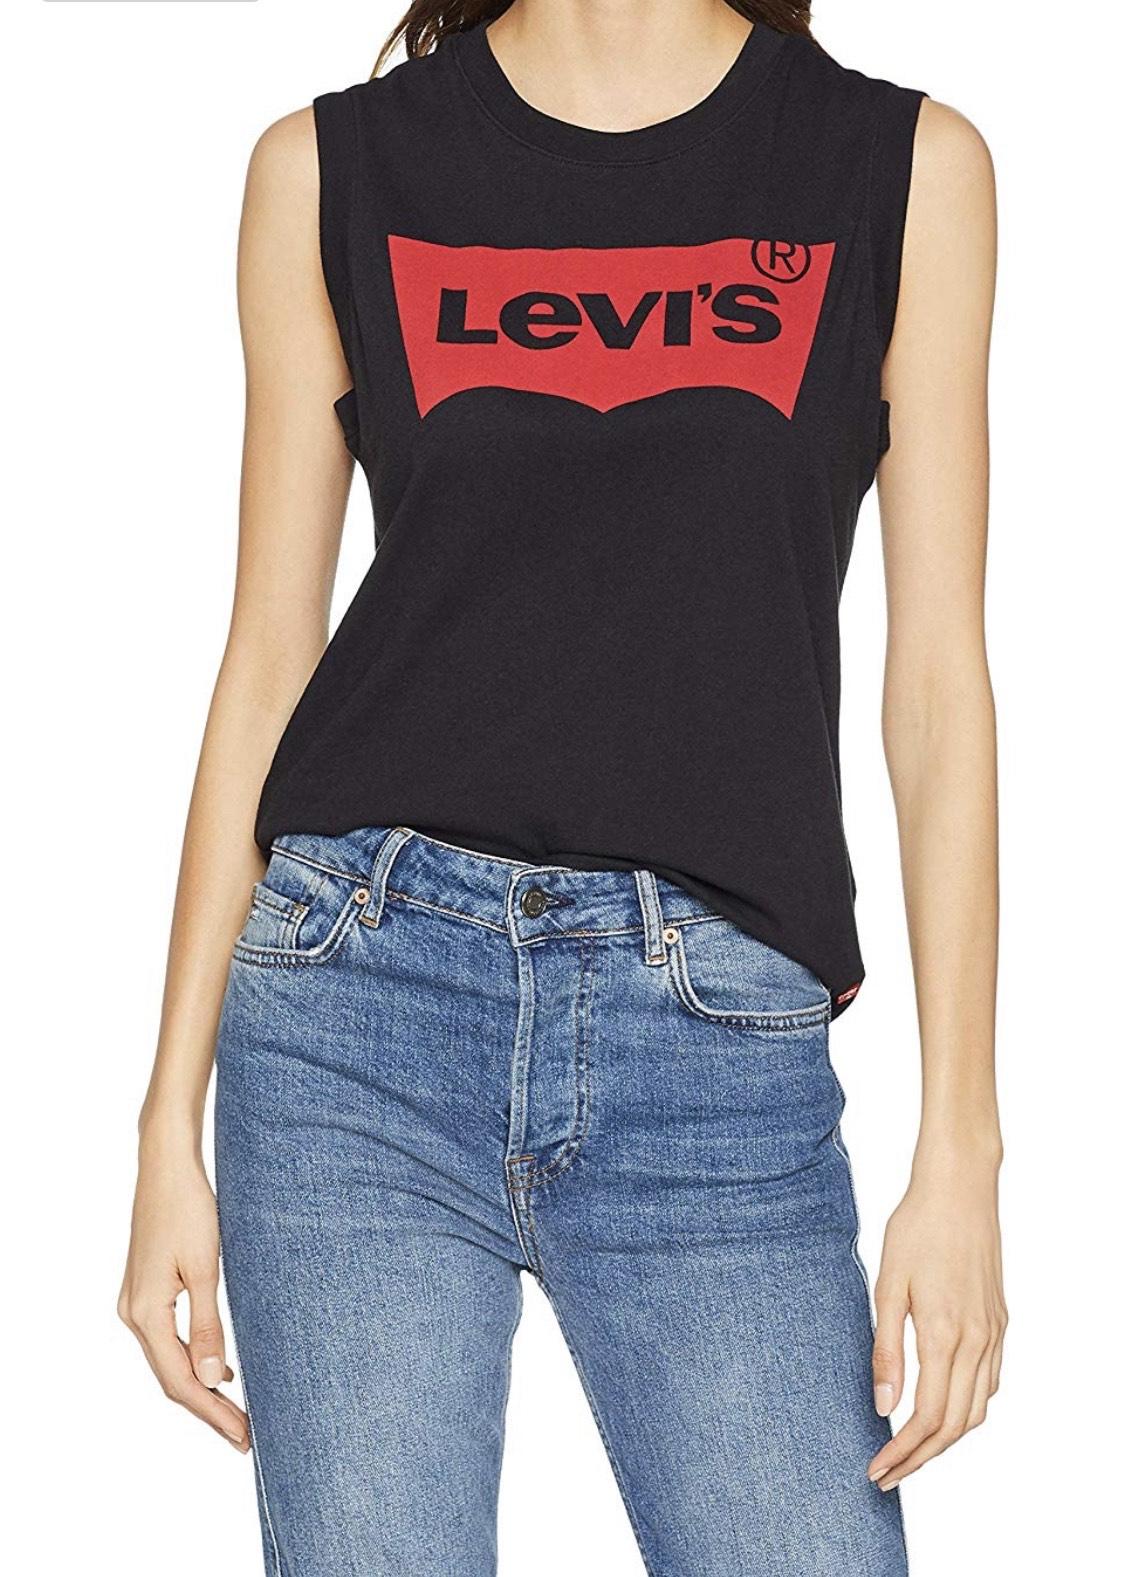 Levi's On Tour Tank Camiseta Deportiva de Tirantes para Mujer